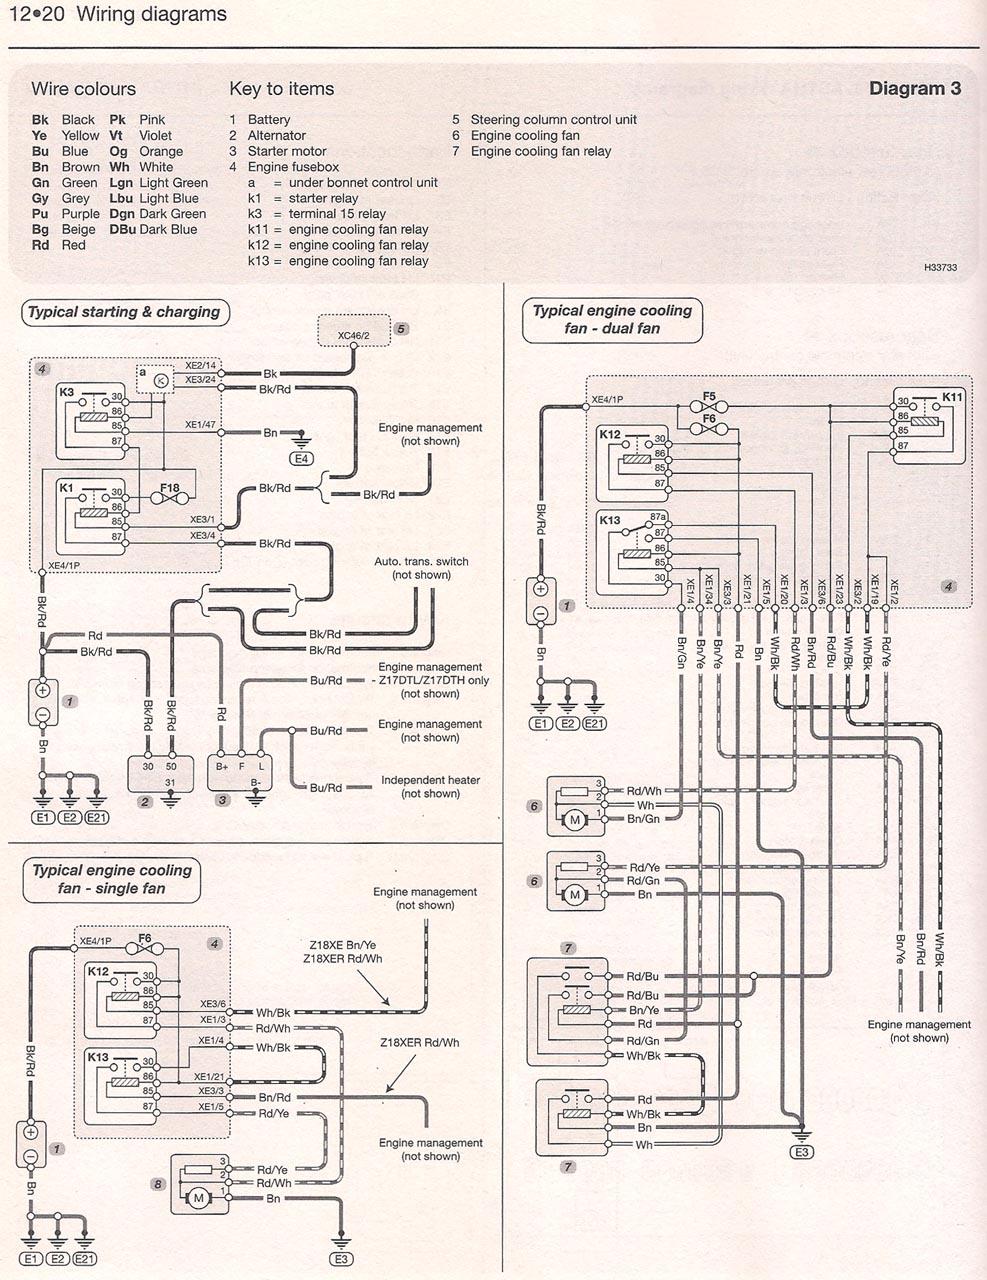 Delphi Radio Wiring Diagram - Roslonek.net